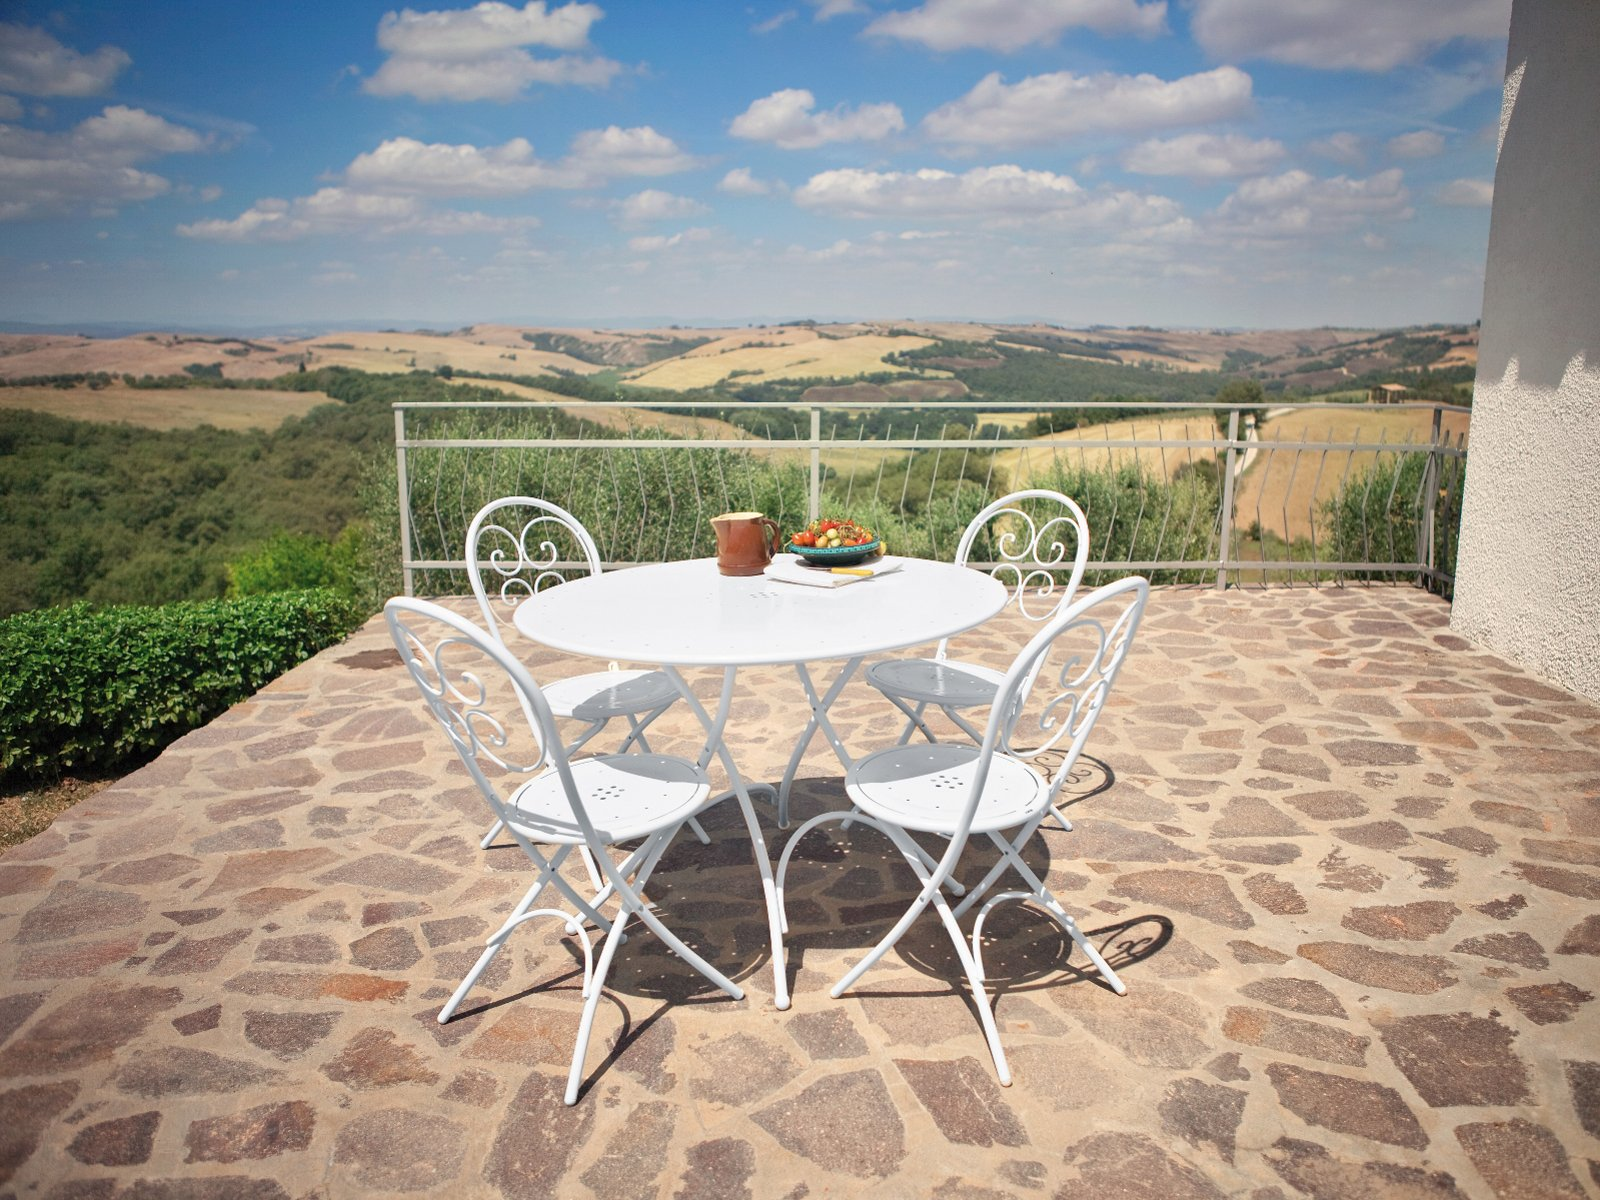 Emejing Table De Jardin Ronde Solid Emu Contemporary Awesome  # Table De Jardin Pliante Emu